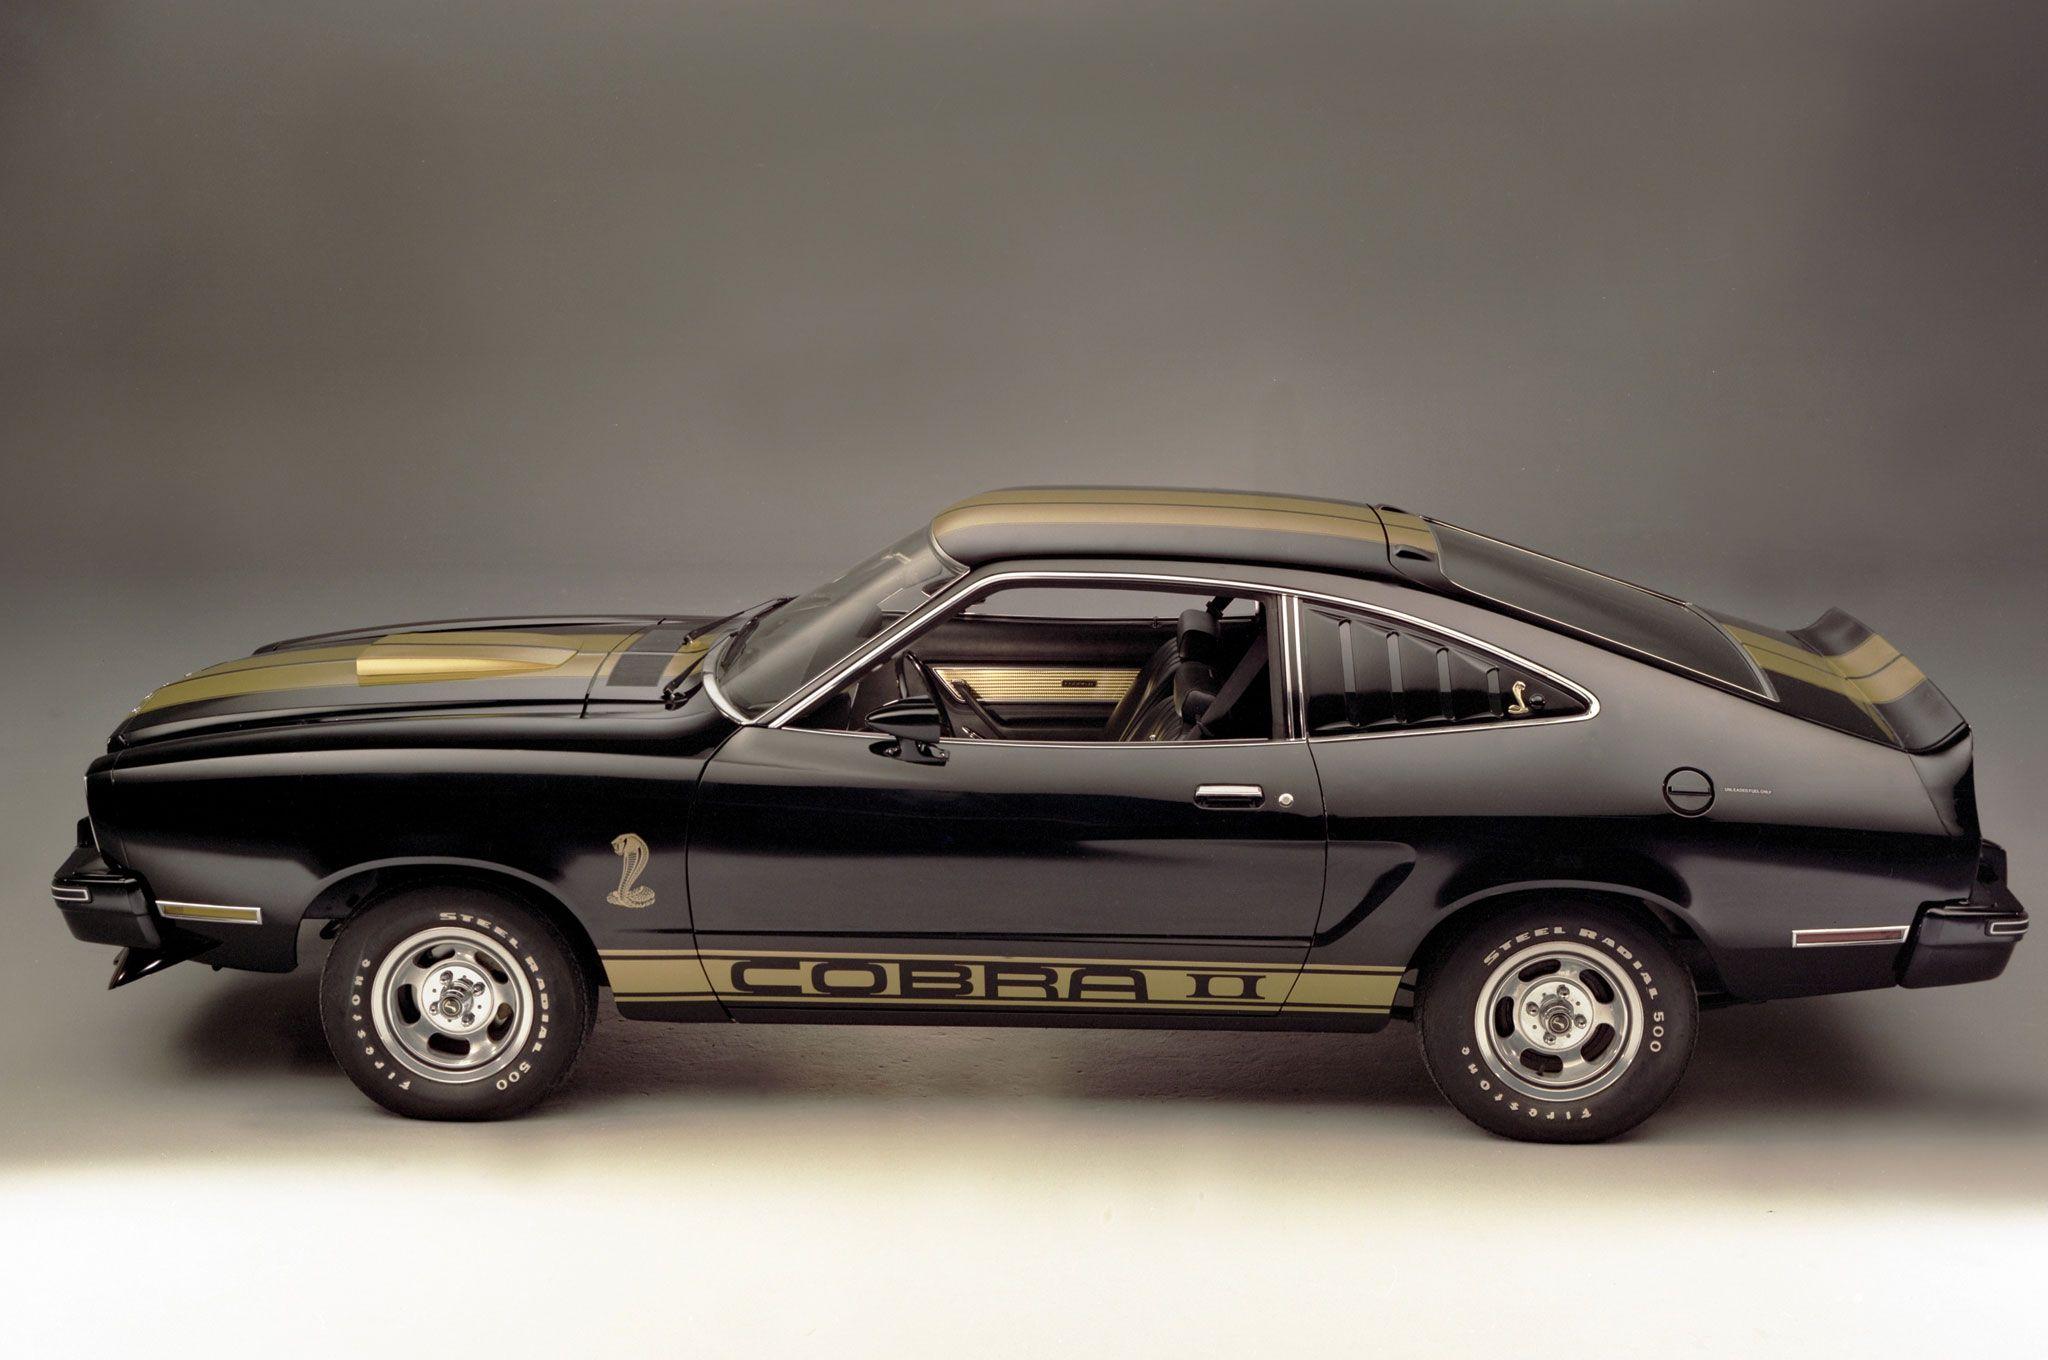 1976 ford cobra Maintenance restoration of old vintage vehicles the